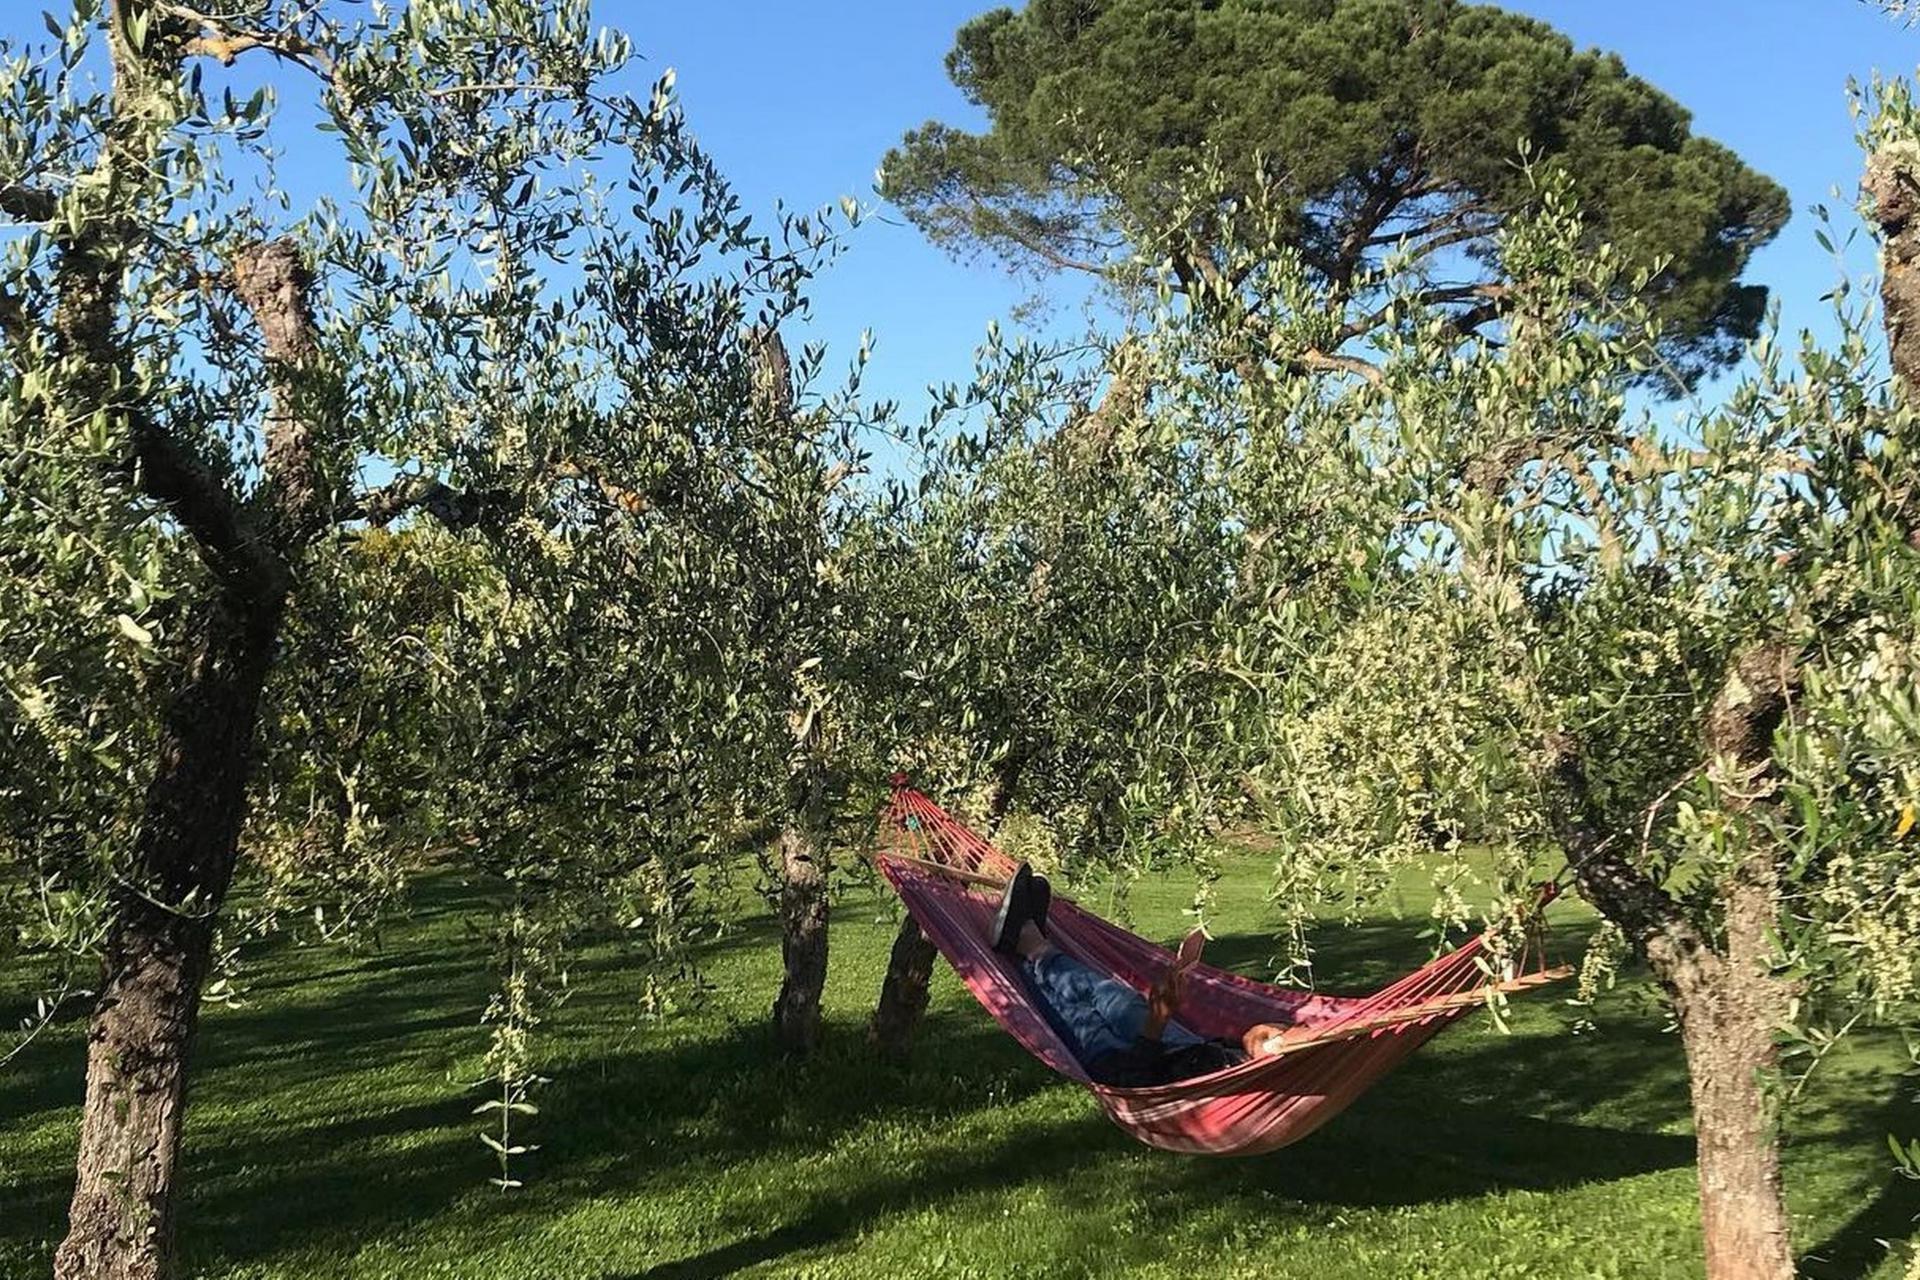 Agriturismo Toscane Luxe agriturismo dichtbij de kust in Toscane